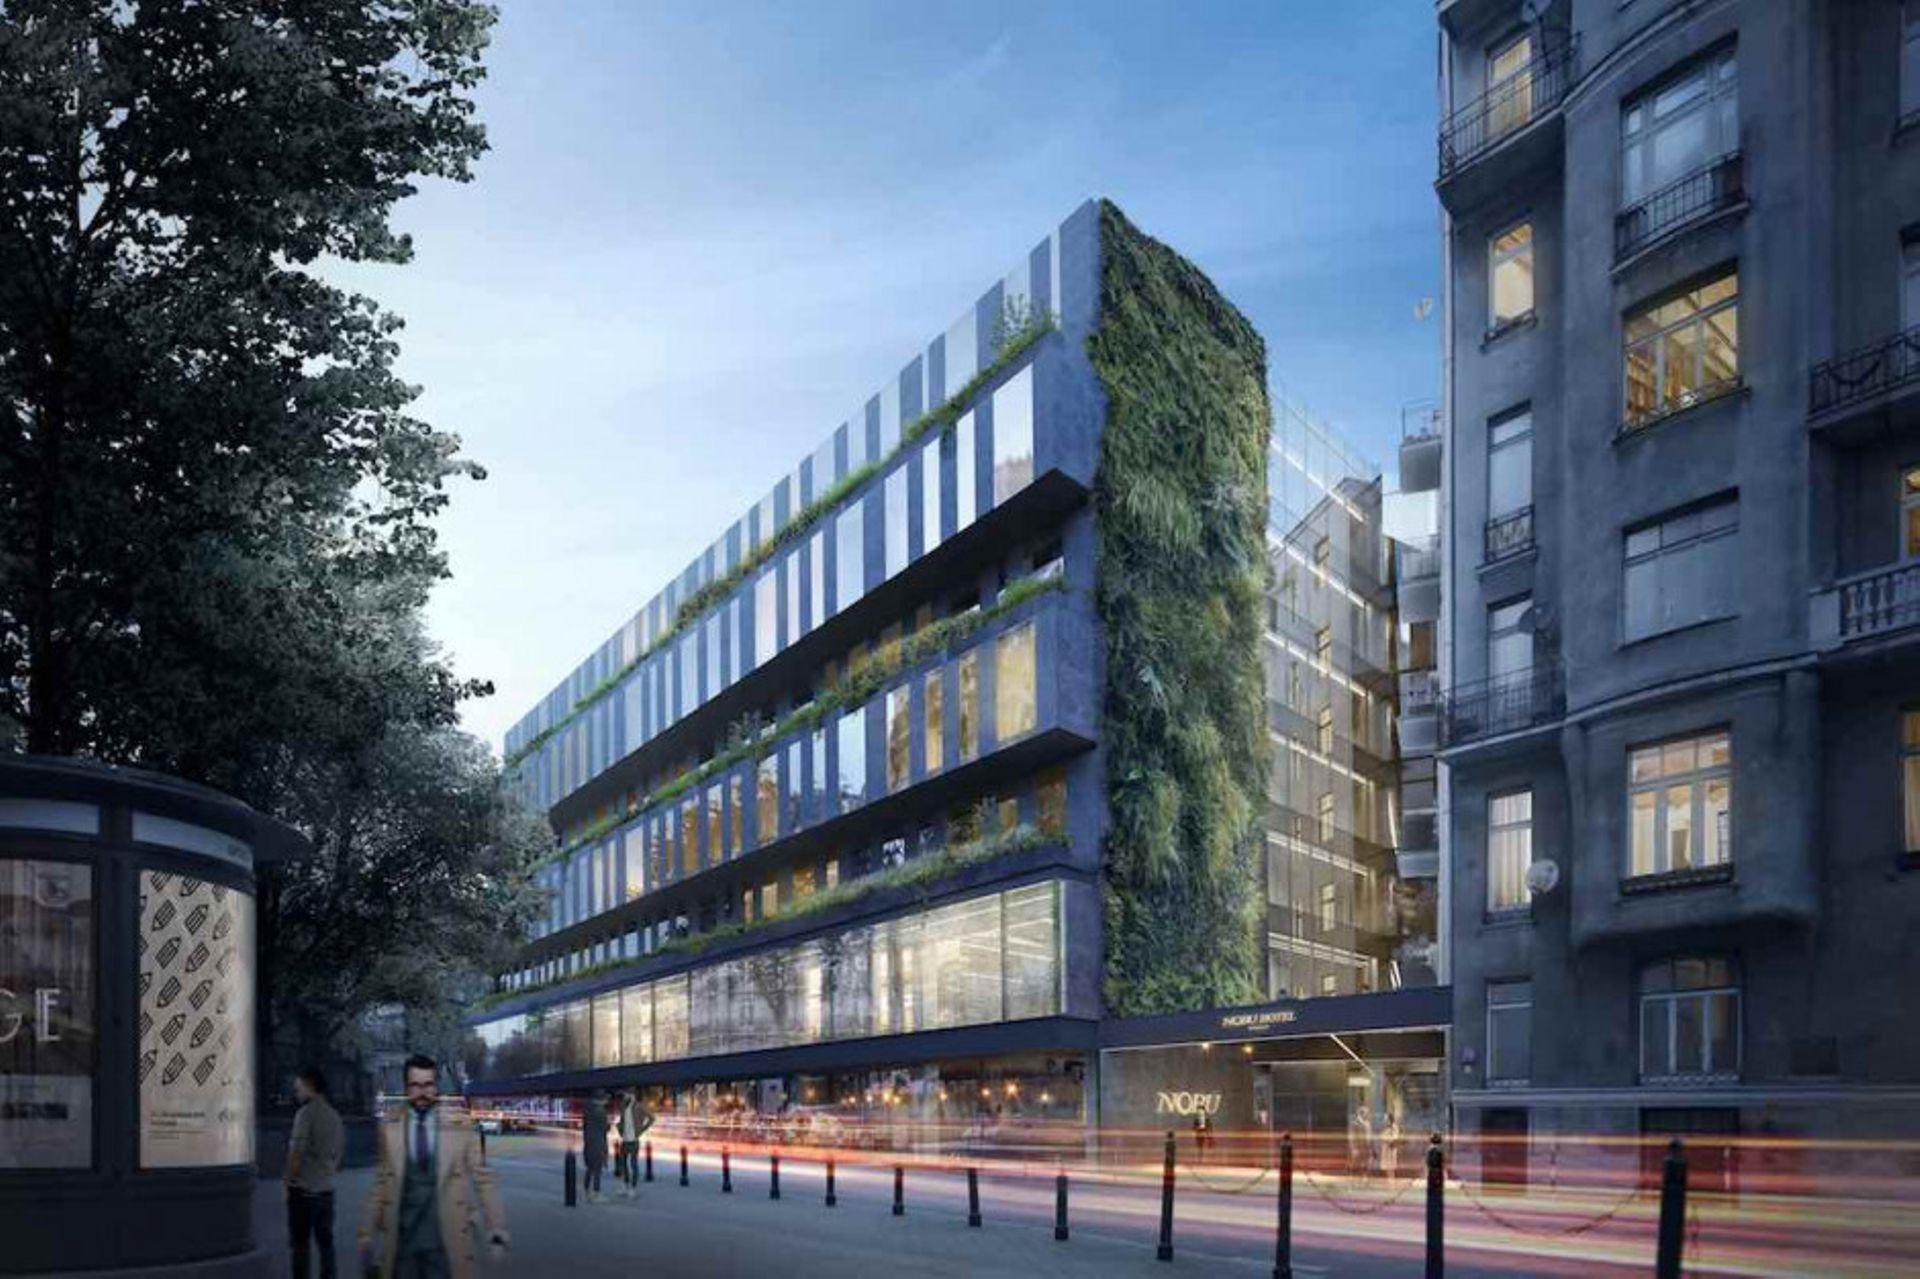 Warszawa: Hotel Nobu otwarty